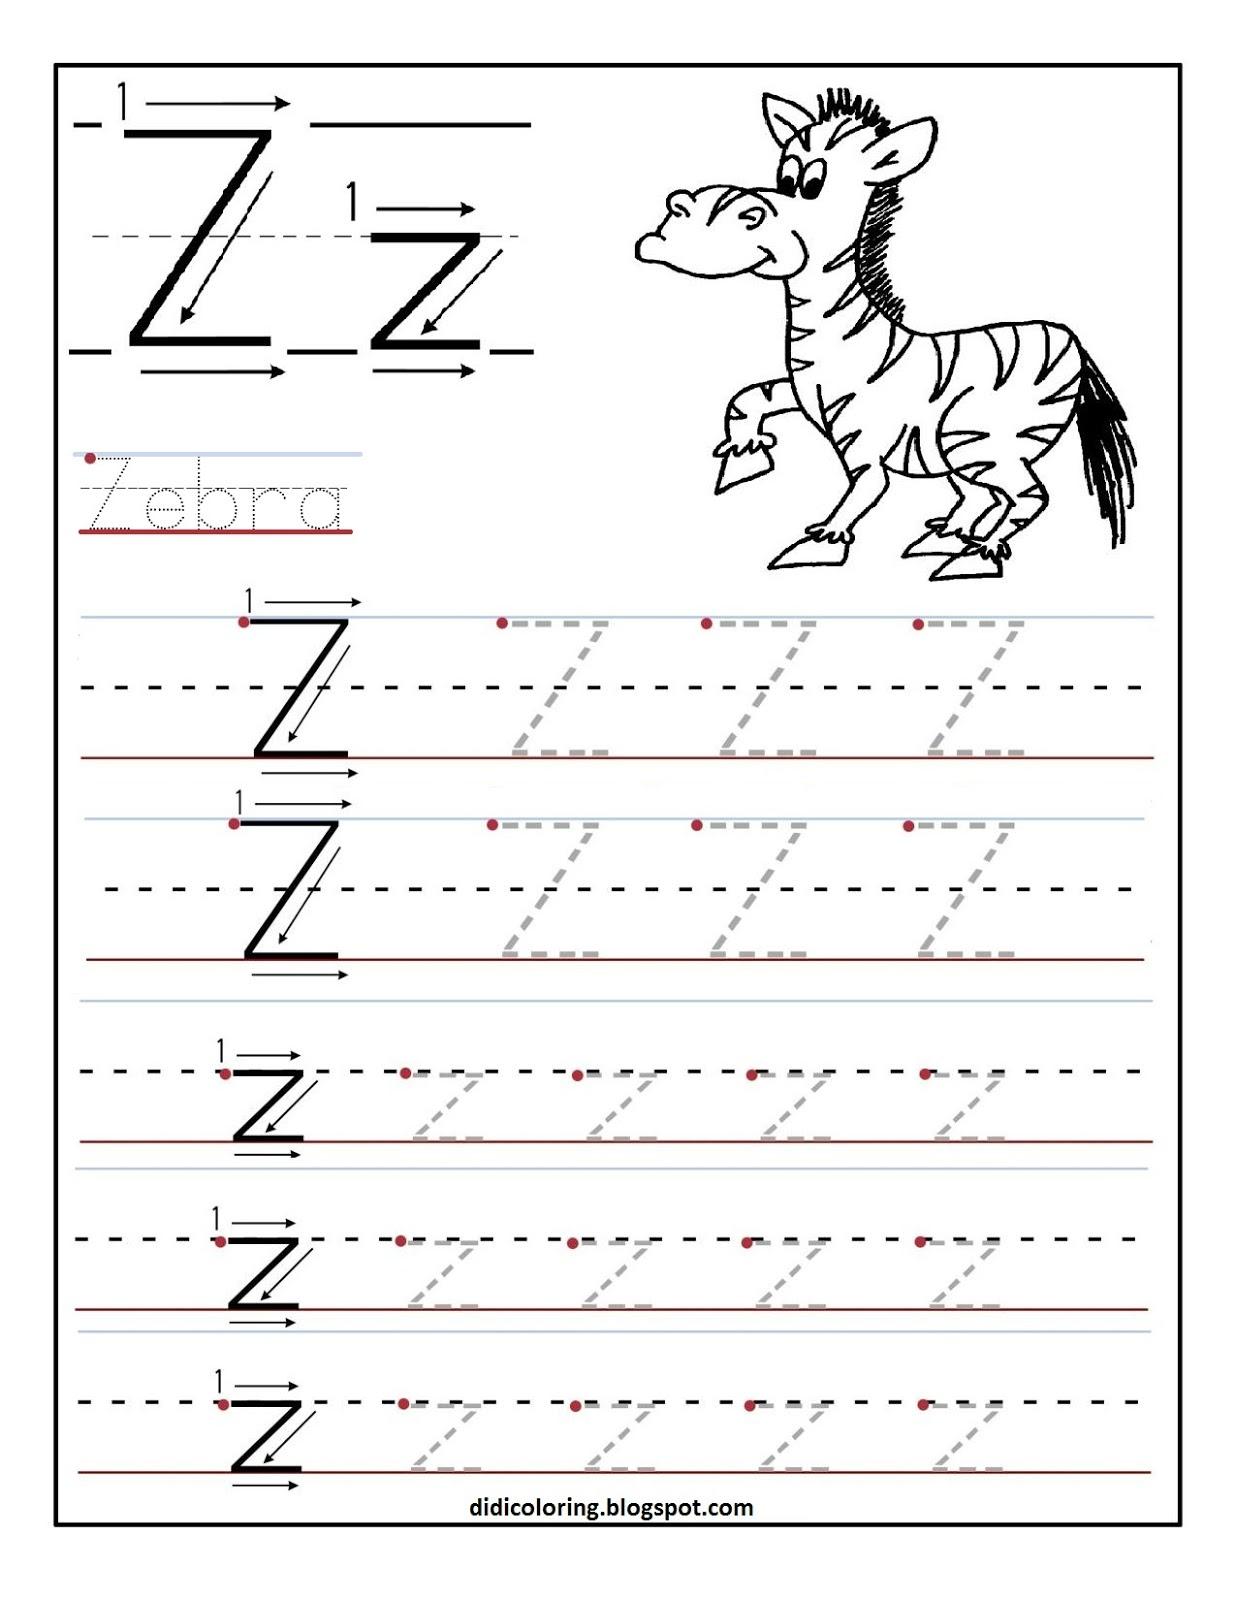 math worksheet : letter z preschool worksheets  letter z tracing worksheets  : S Worksheets For Kindergarten